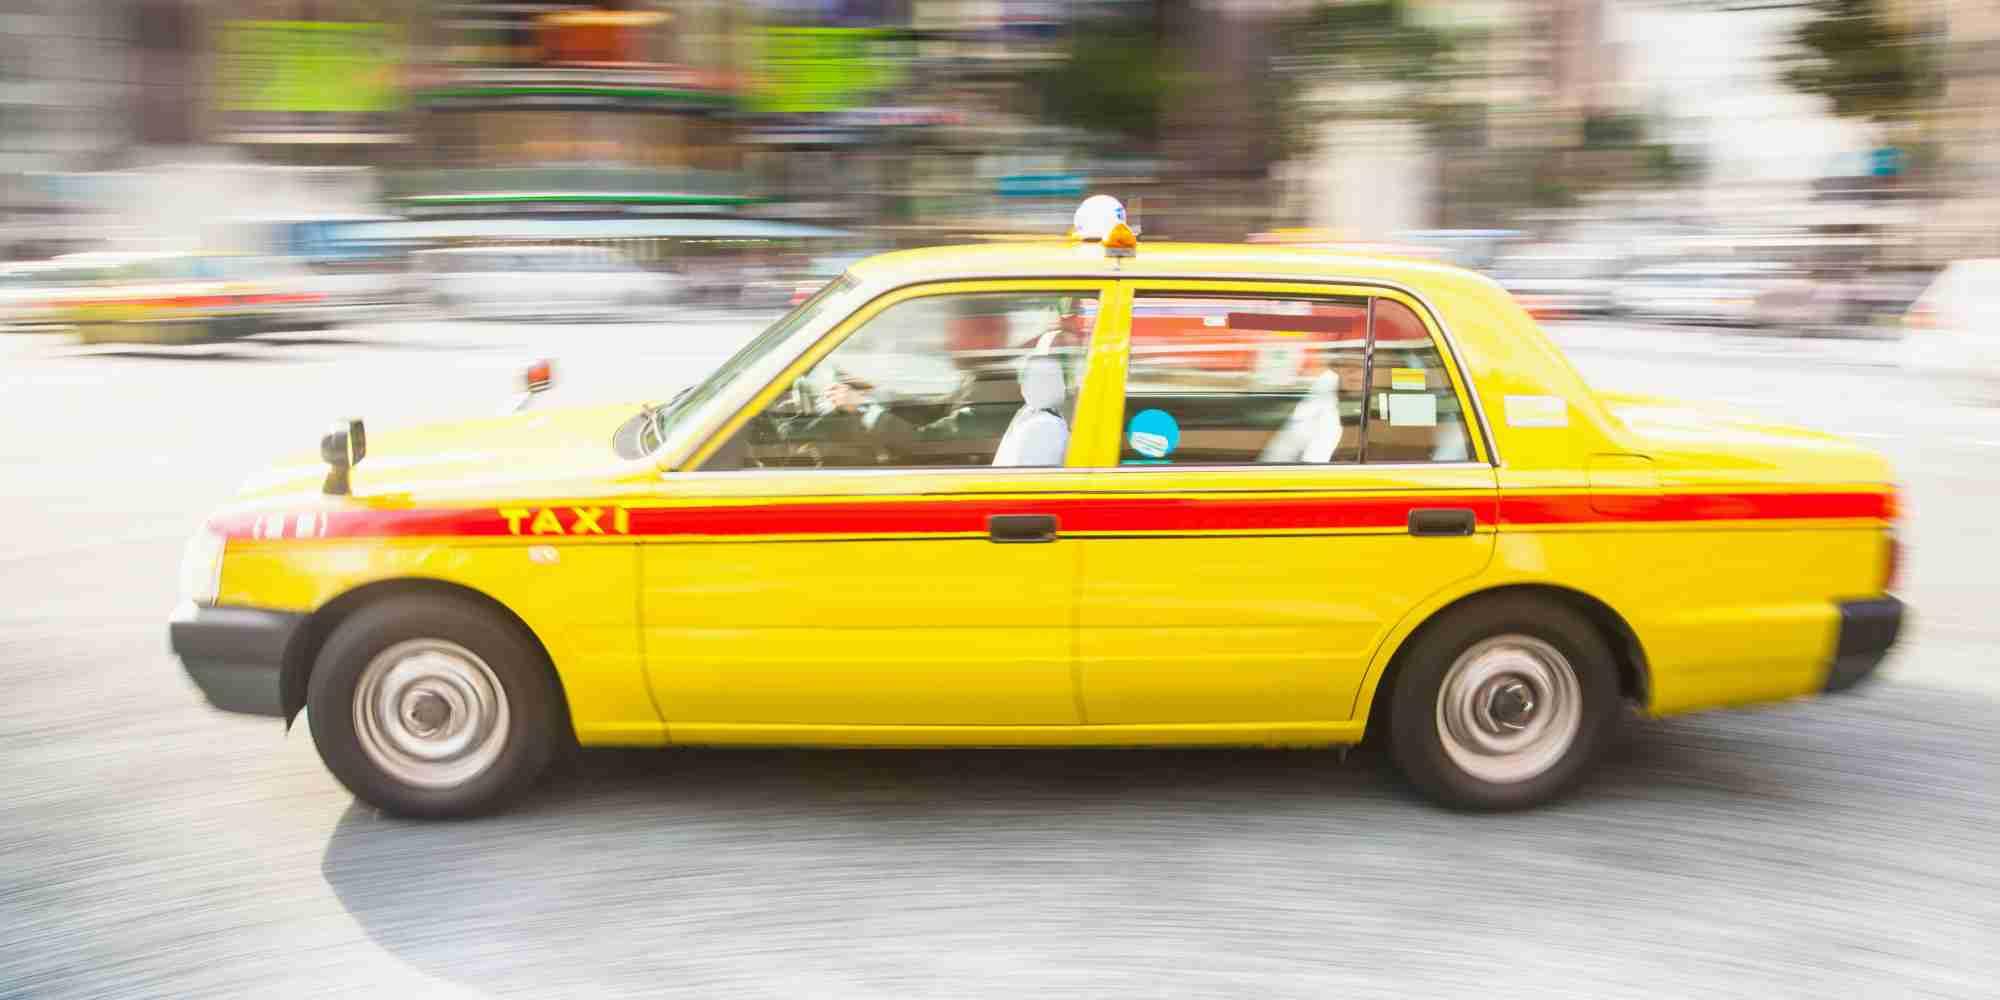 JR北海道、センター試験の受験生をタクシーで試験場に送る 特急運休で